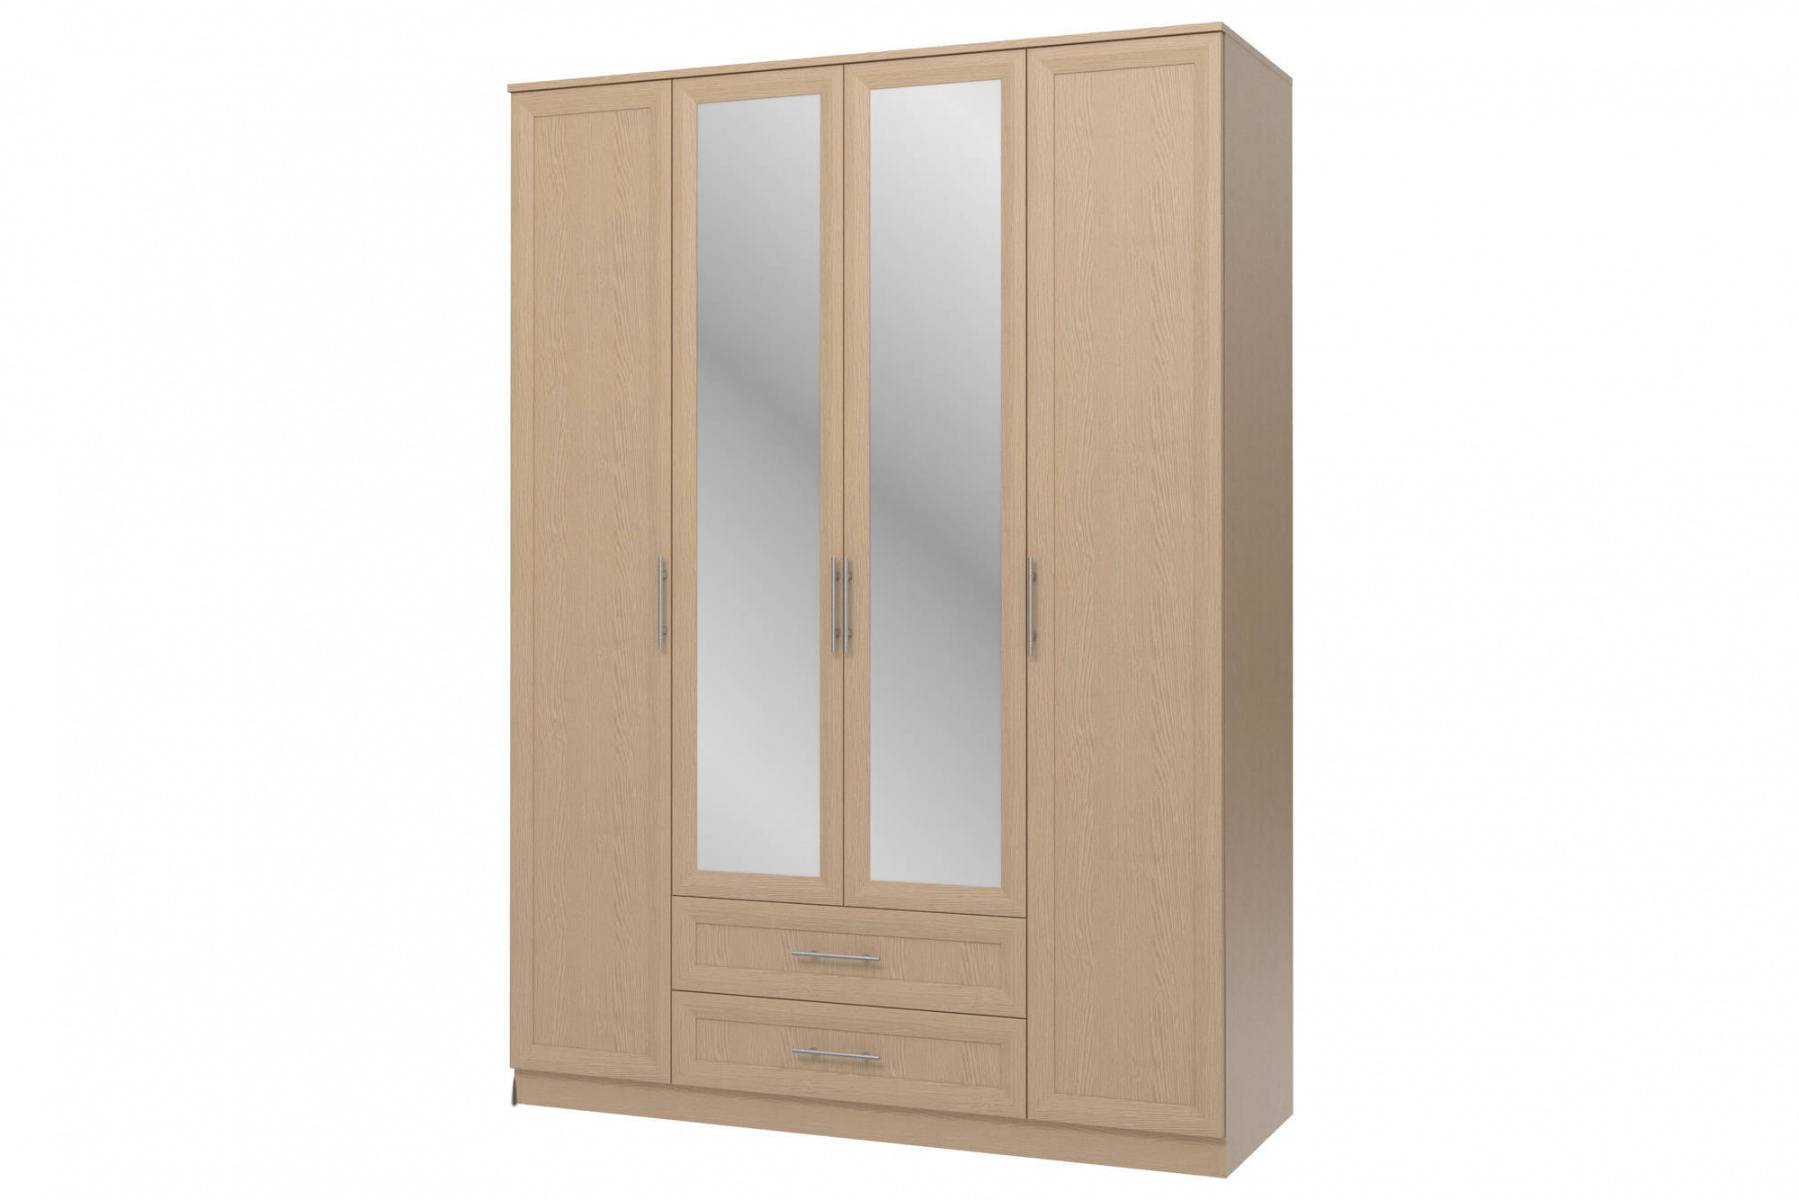 Фото Шкаф 4-х дверный с зеркалами Юлианна СБ.Н-074-01